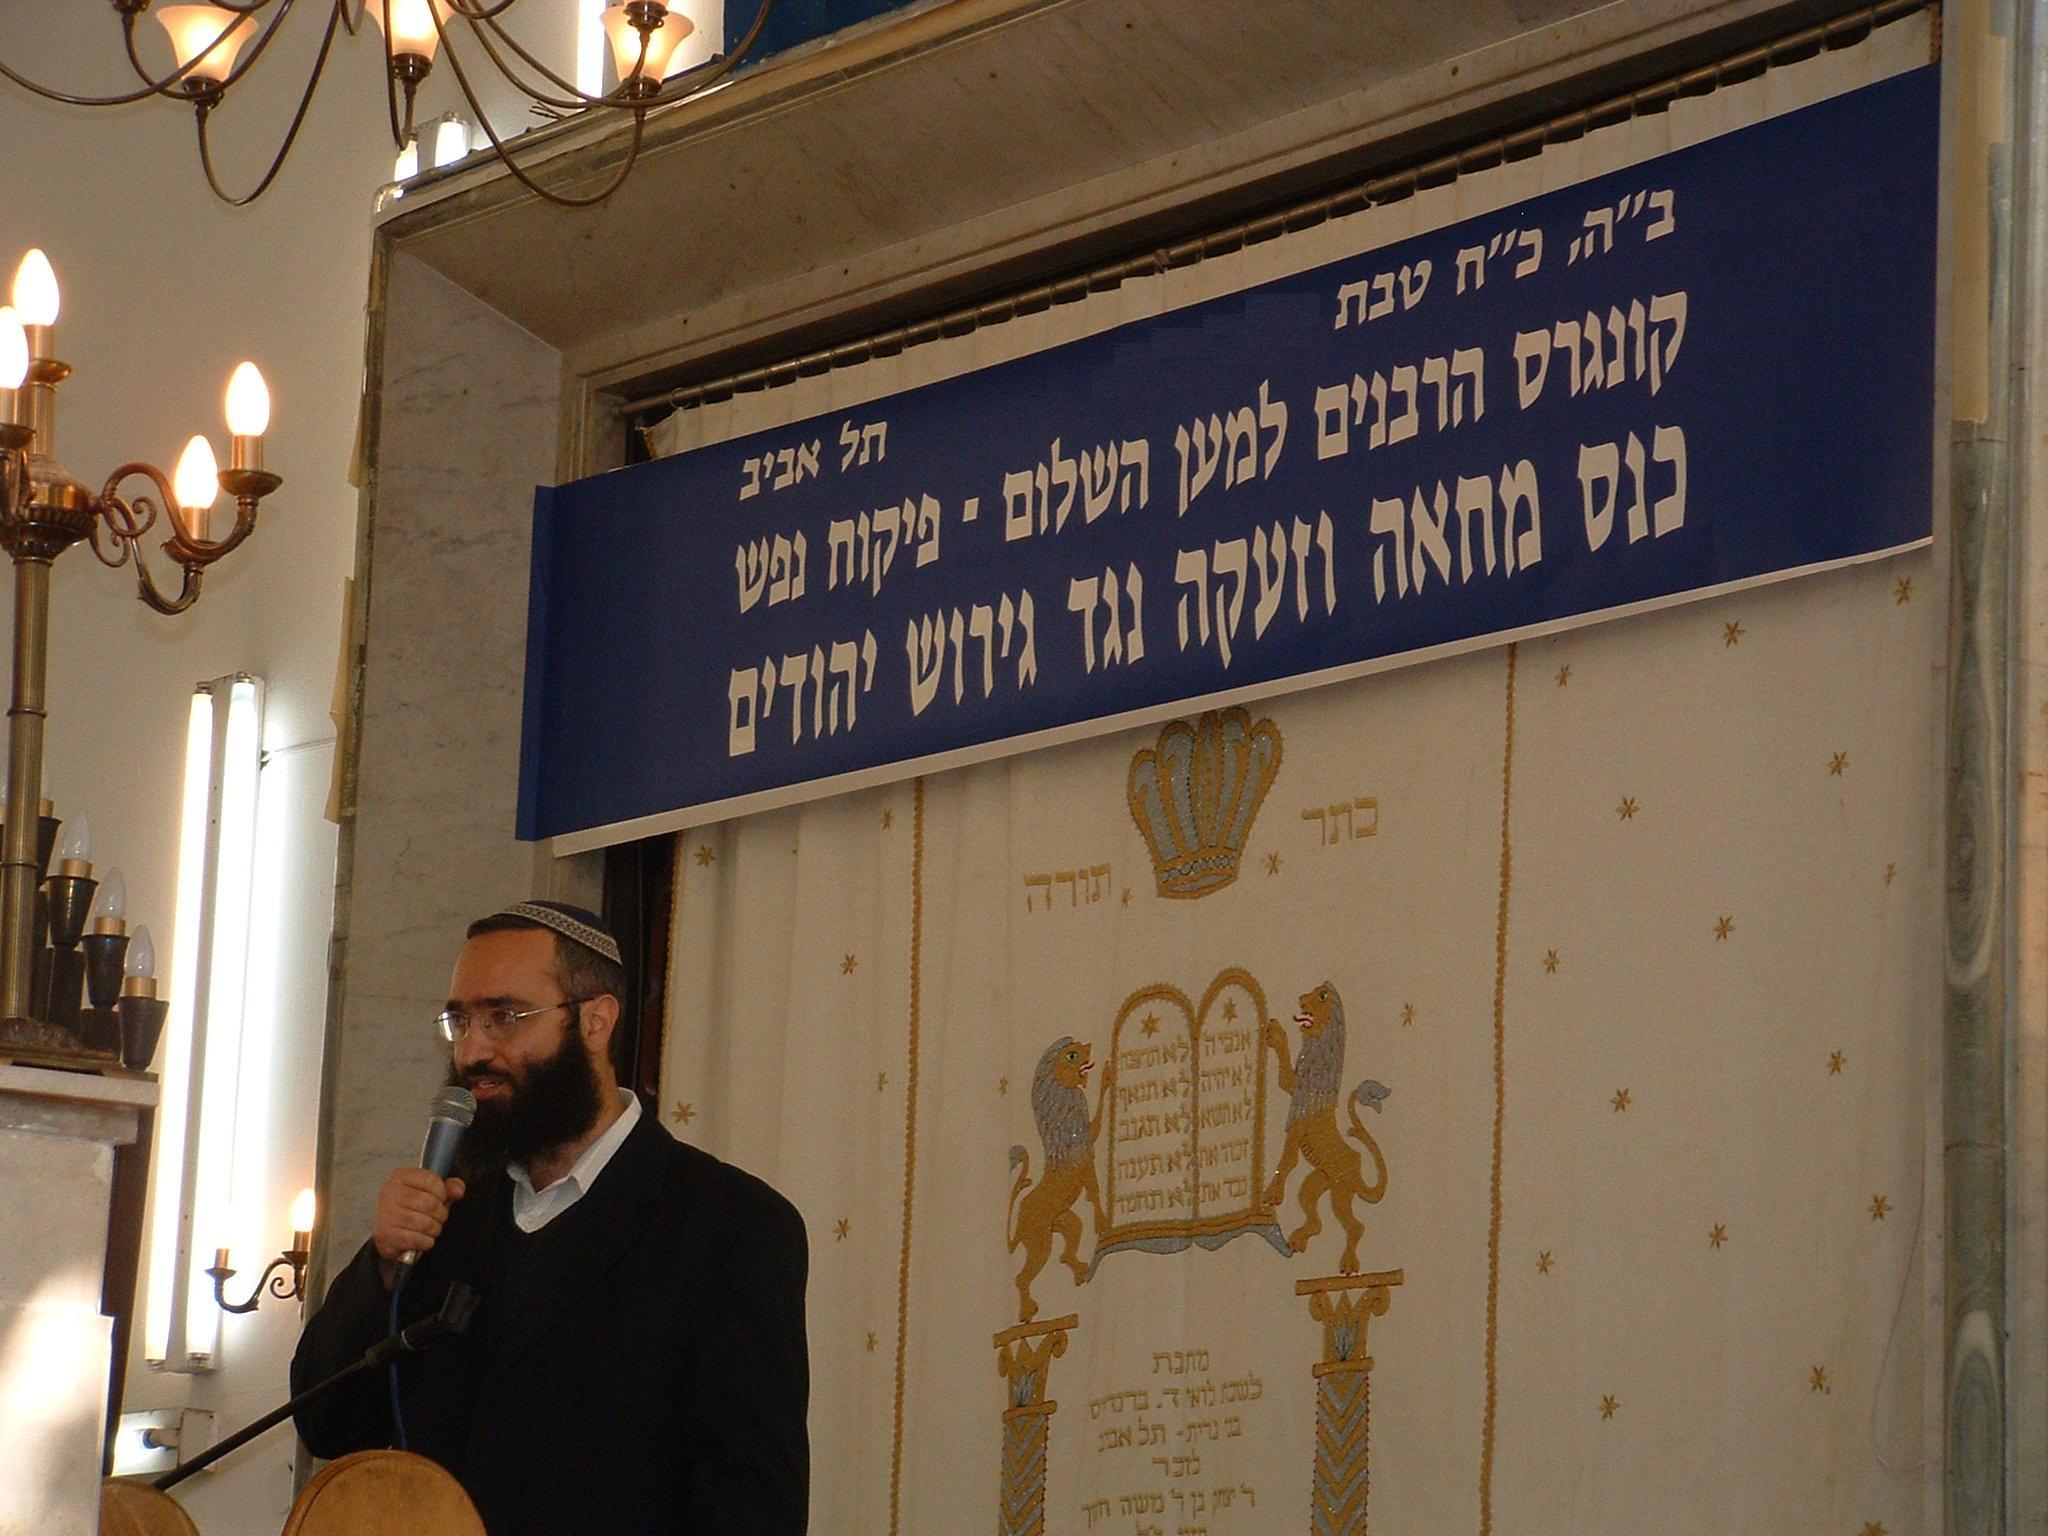 RABBINICAL CONGRESS CALLS ON ISRAELI GOV'T TO SHOW ZERO RESTRAINT AGAINST BURNING KITES